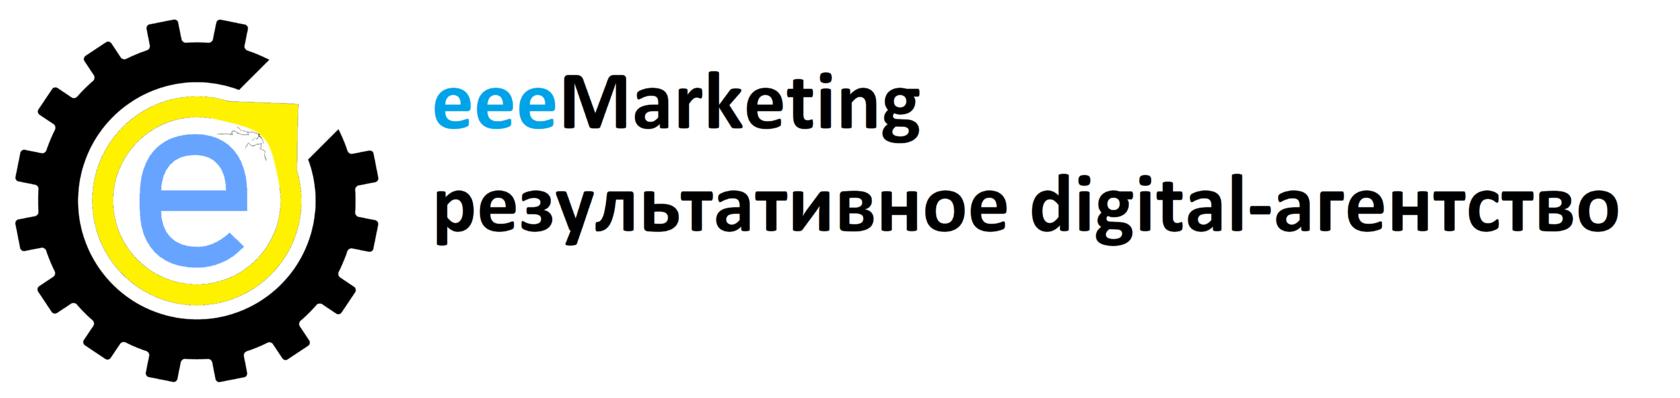 eeeMarketing результативное digital-агентство